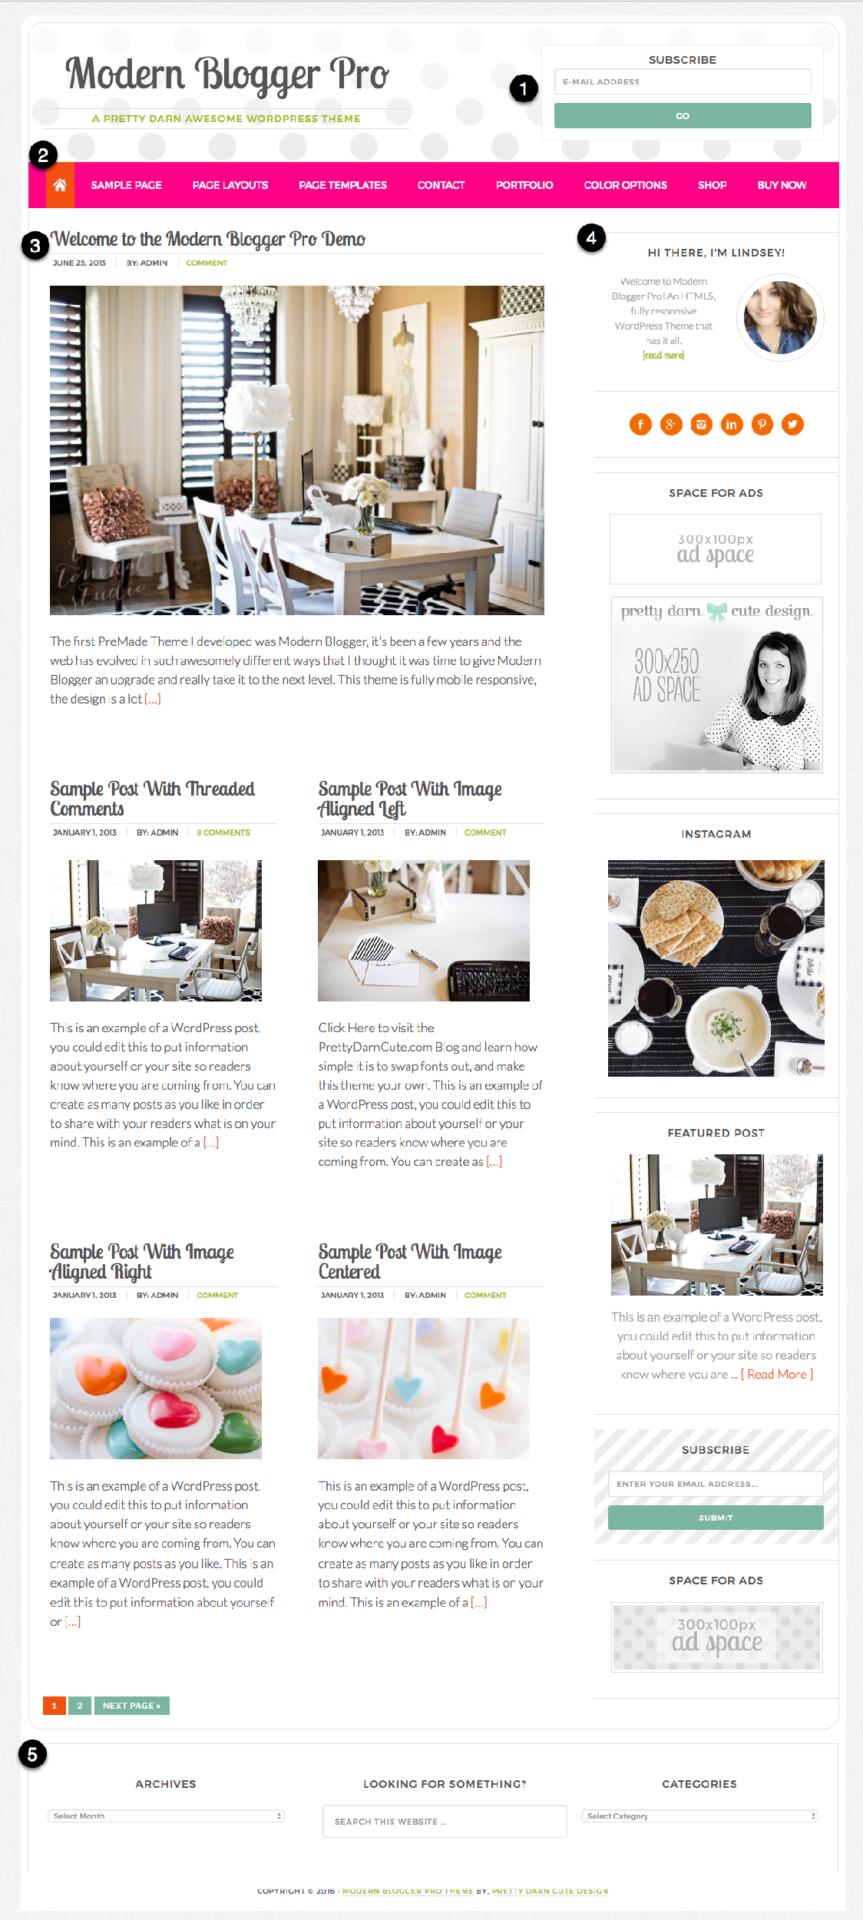 Modern Blogger Pro Visual Guide